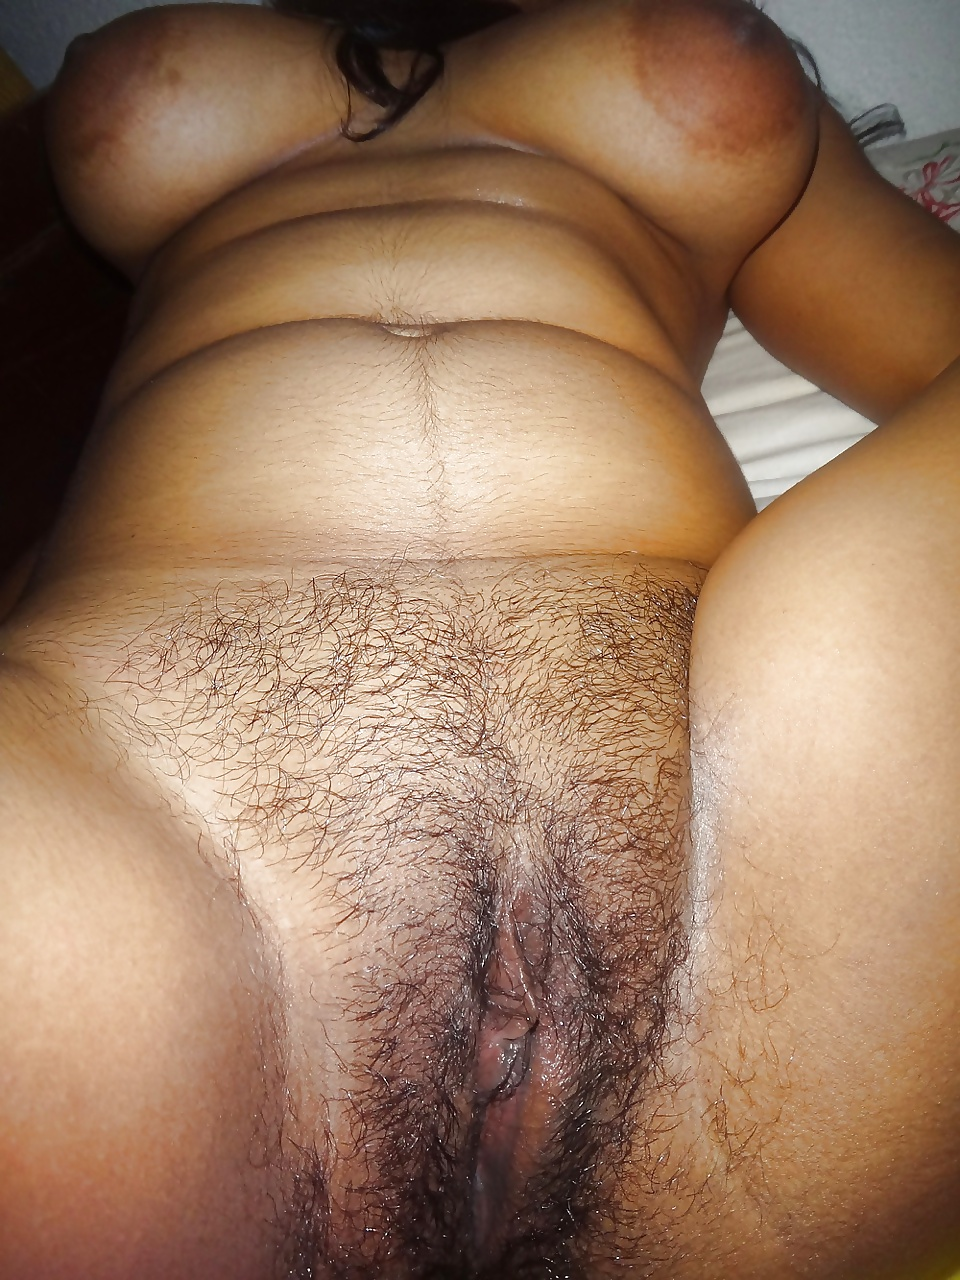 Pussy wet sex girls photo pitcher arab